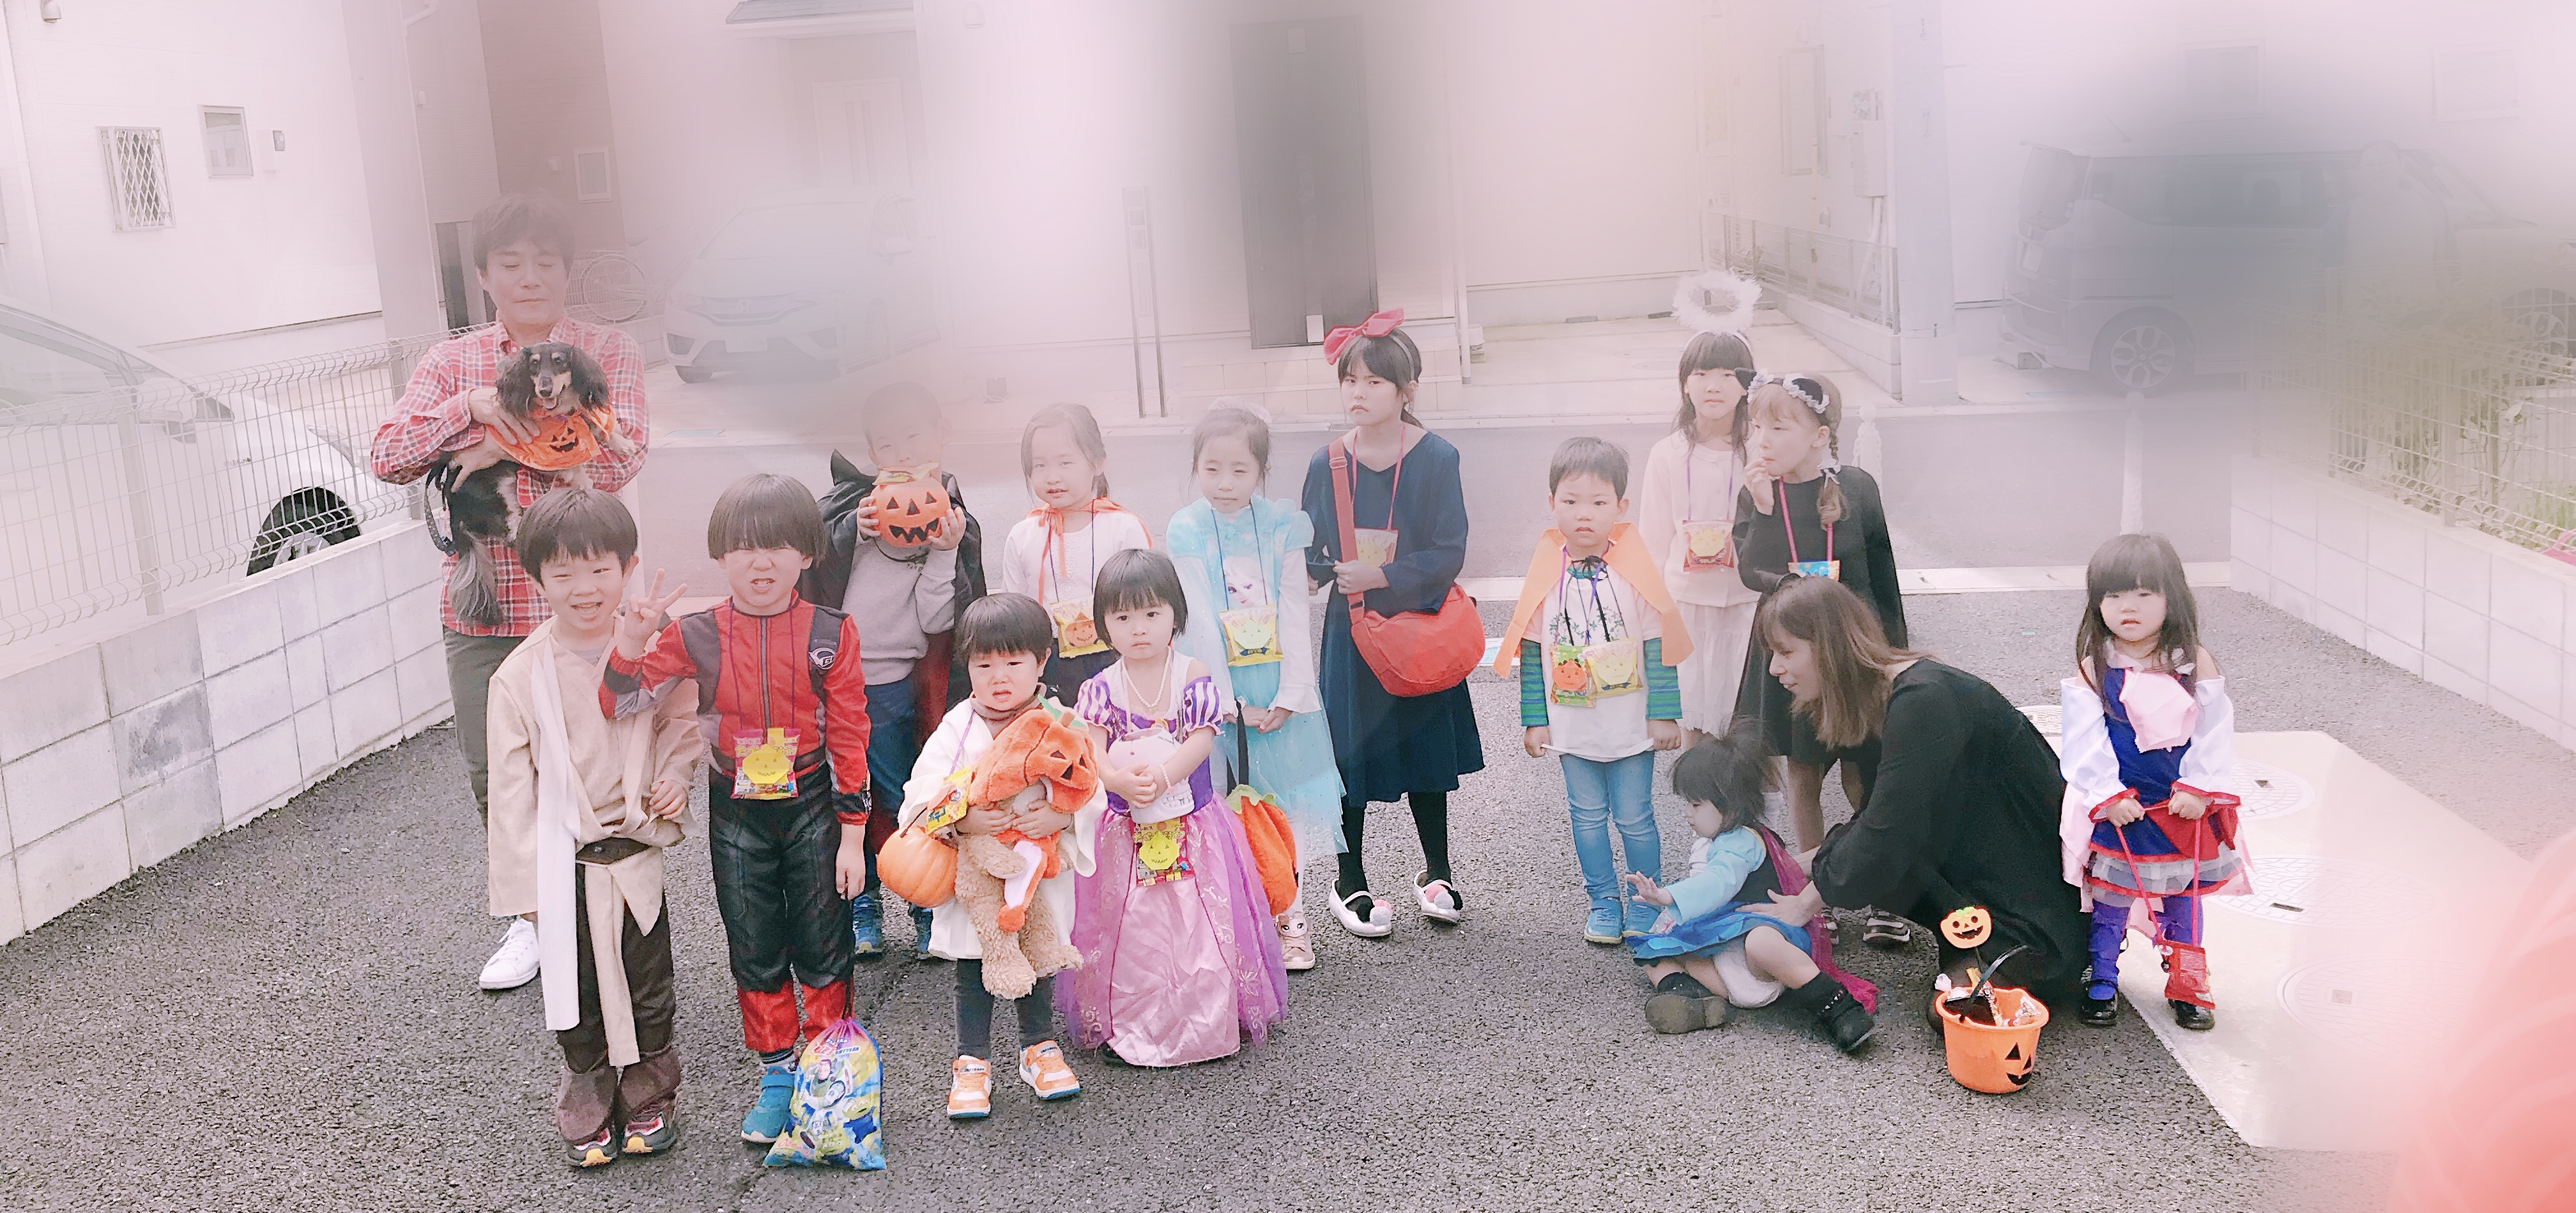 Halloween parade in localcommunity